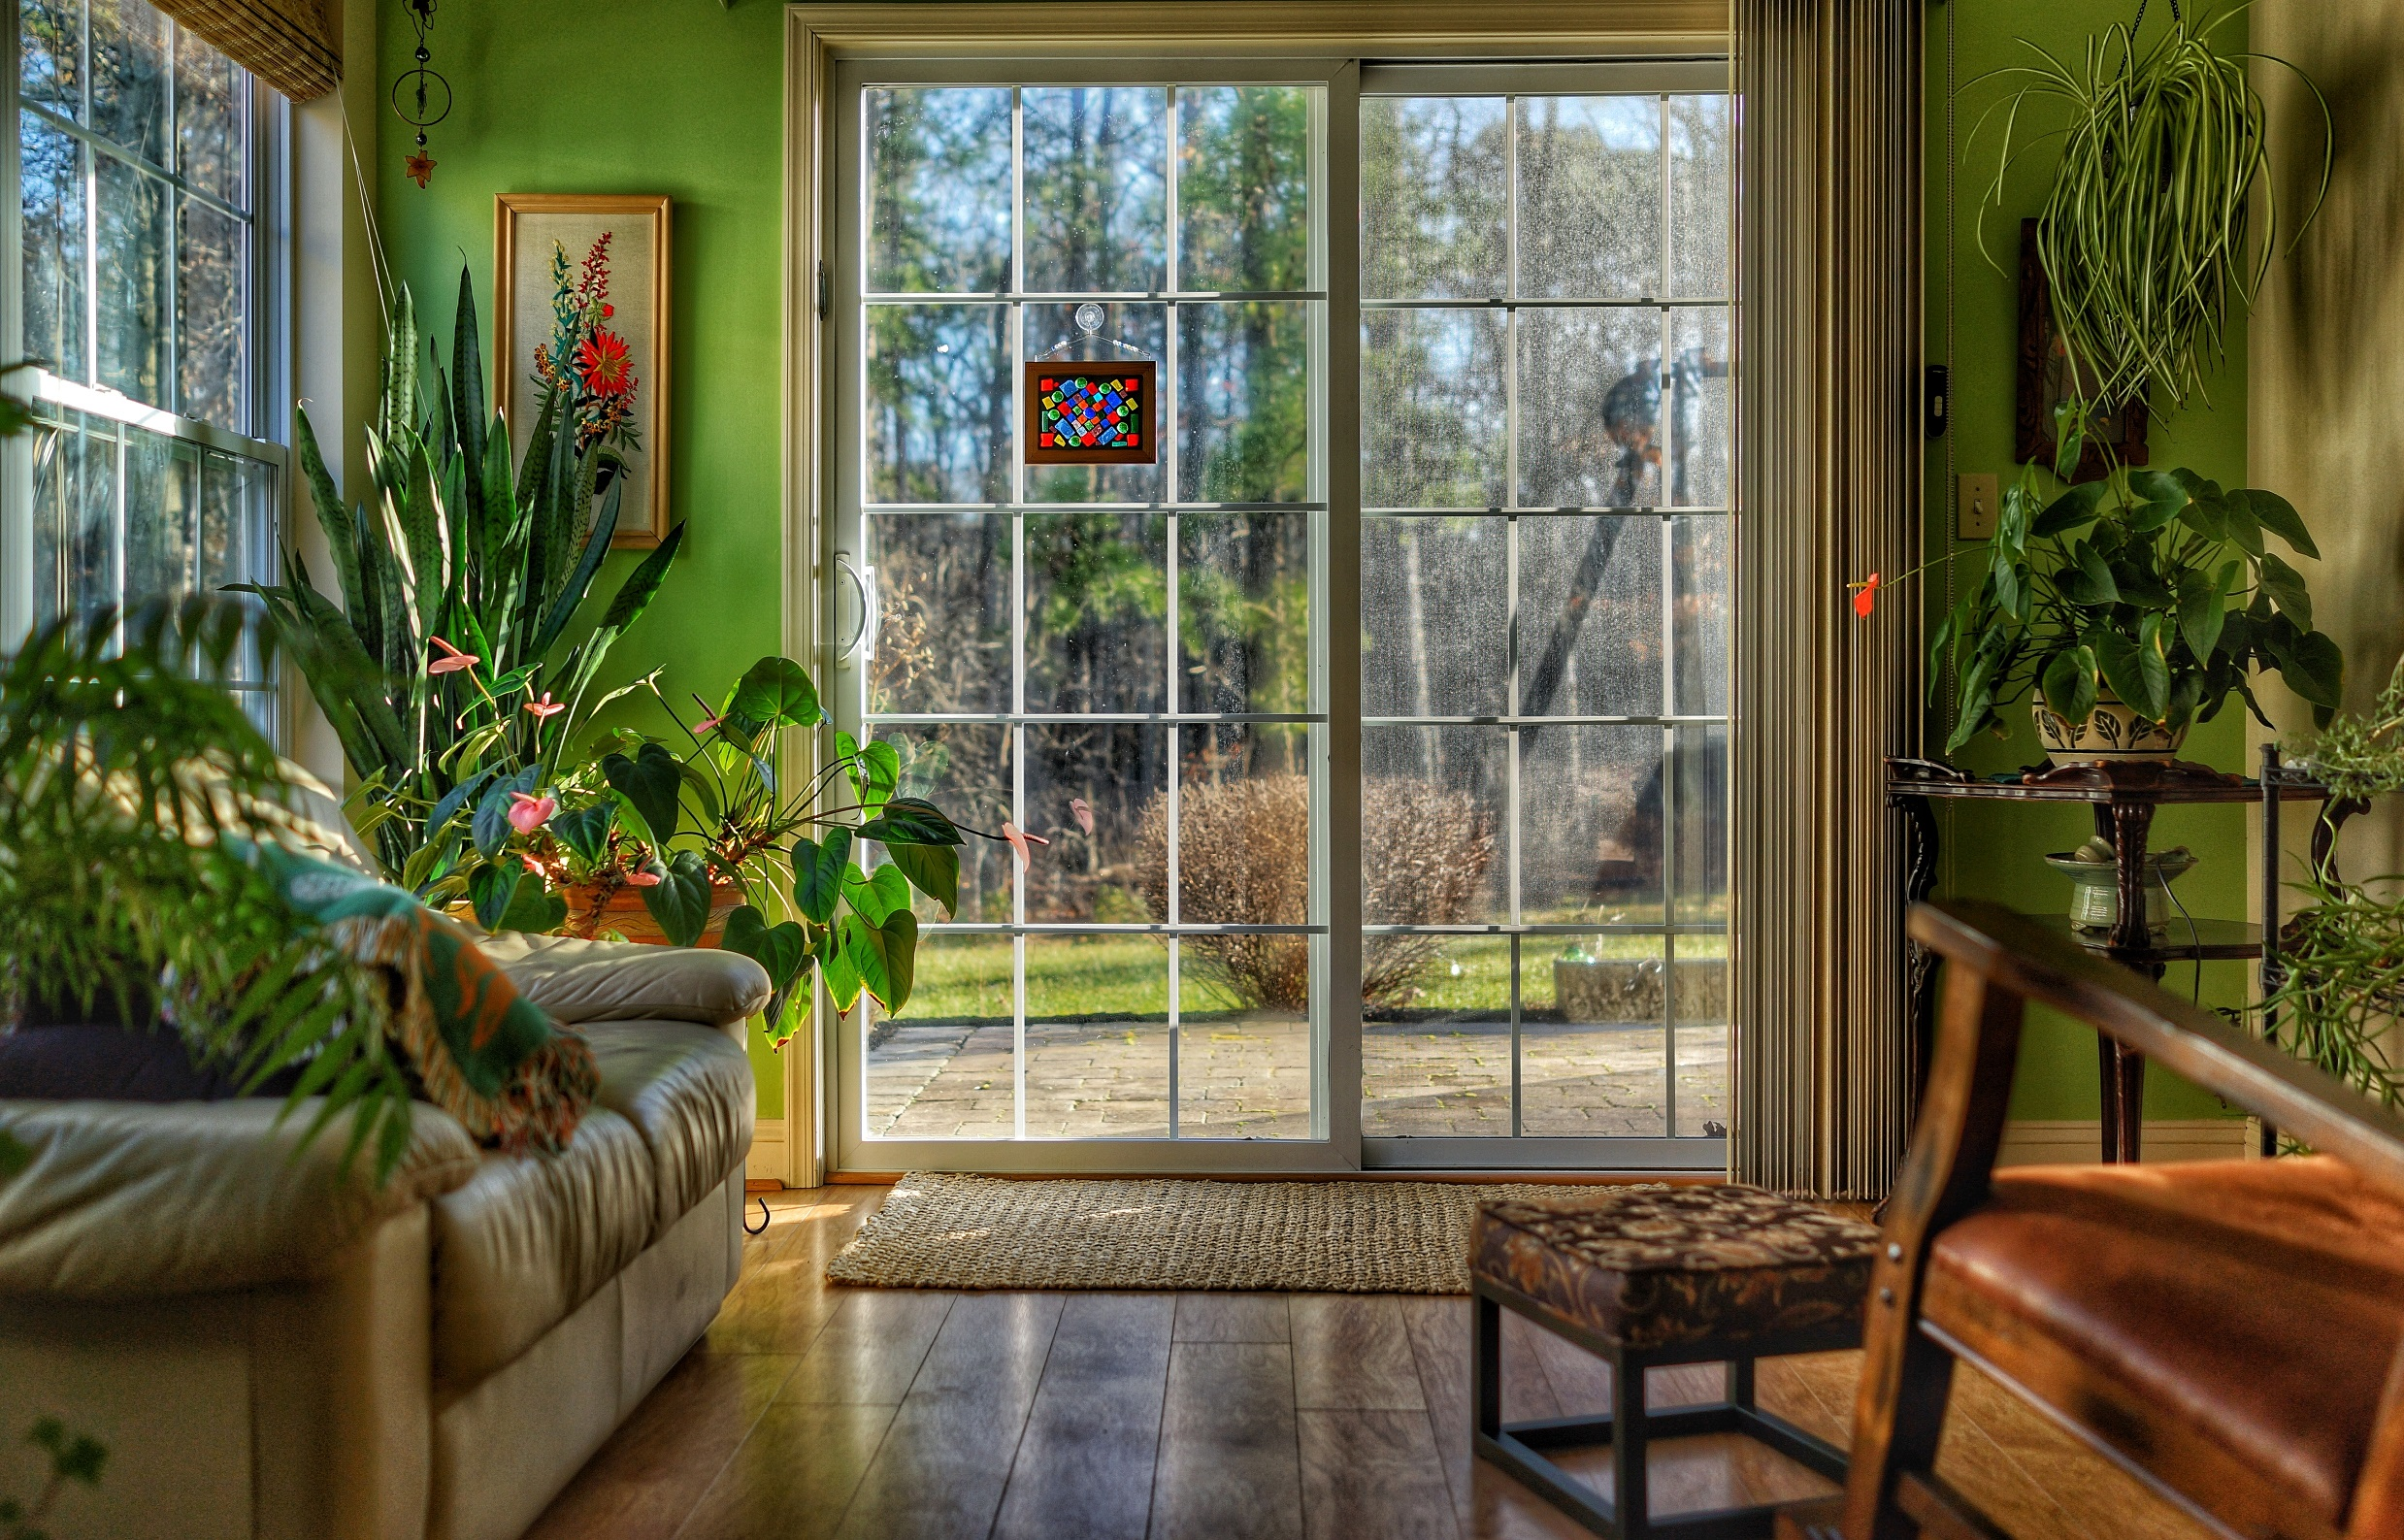 colores relajantes para dormitorio verde